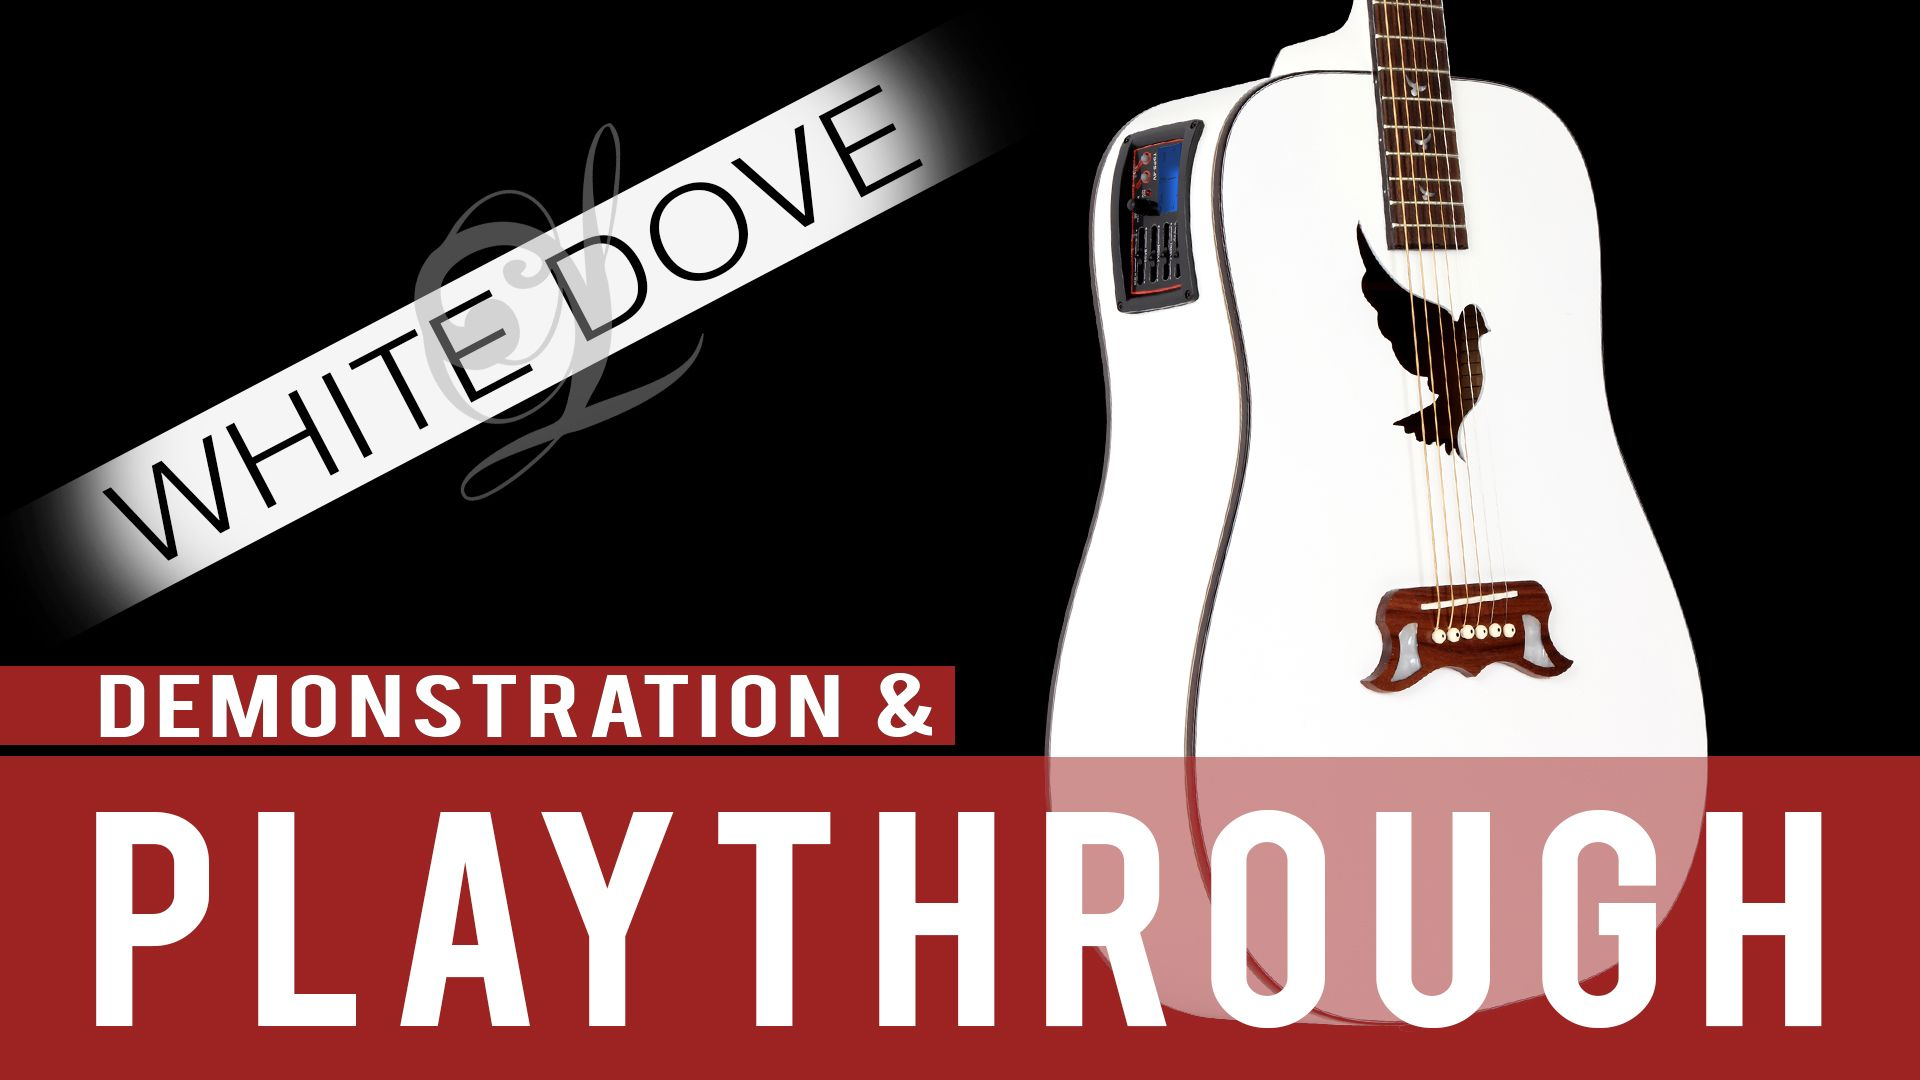 Lindo White Dove Electro Acoustic Guitar Demonstration Playthrough Tone Demo Electro Acoustic Guitar White Doves Acoustic